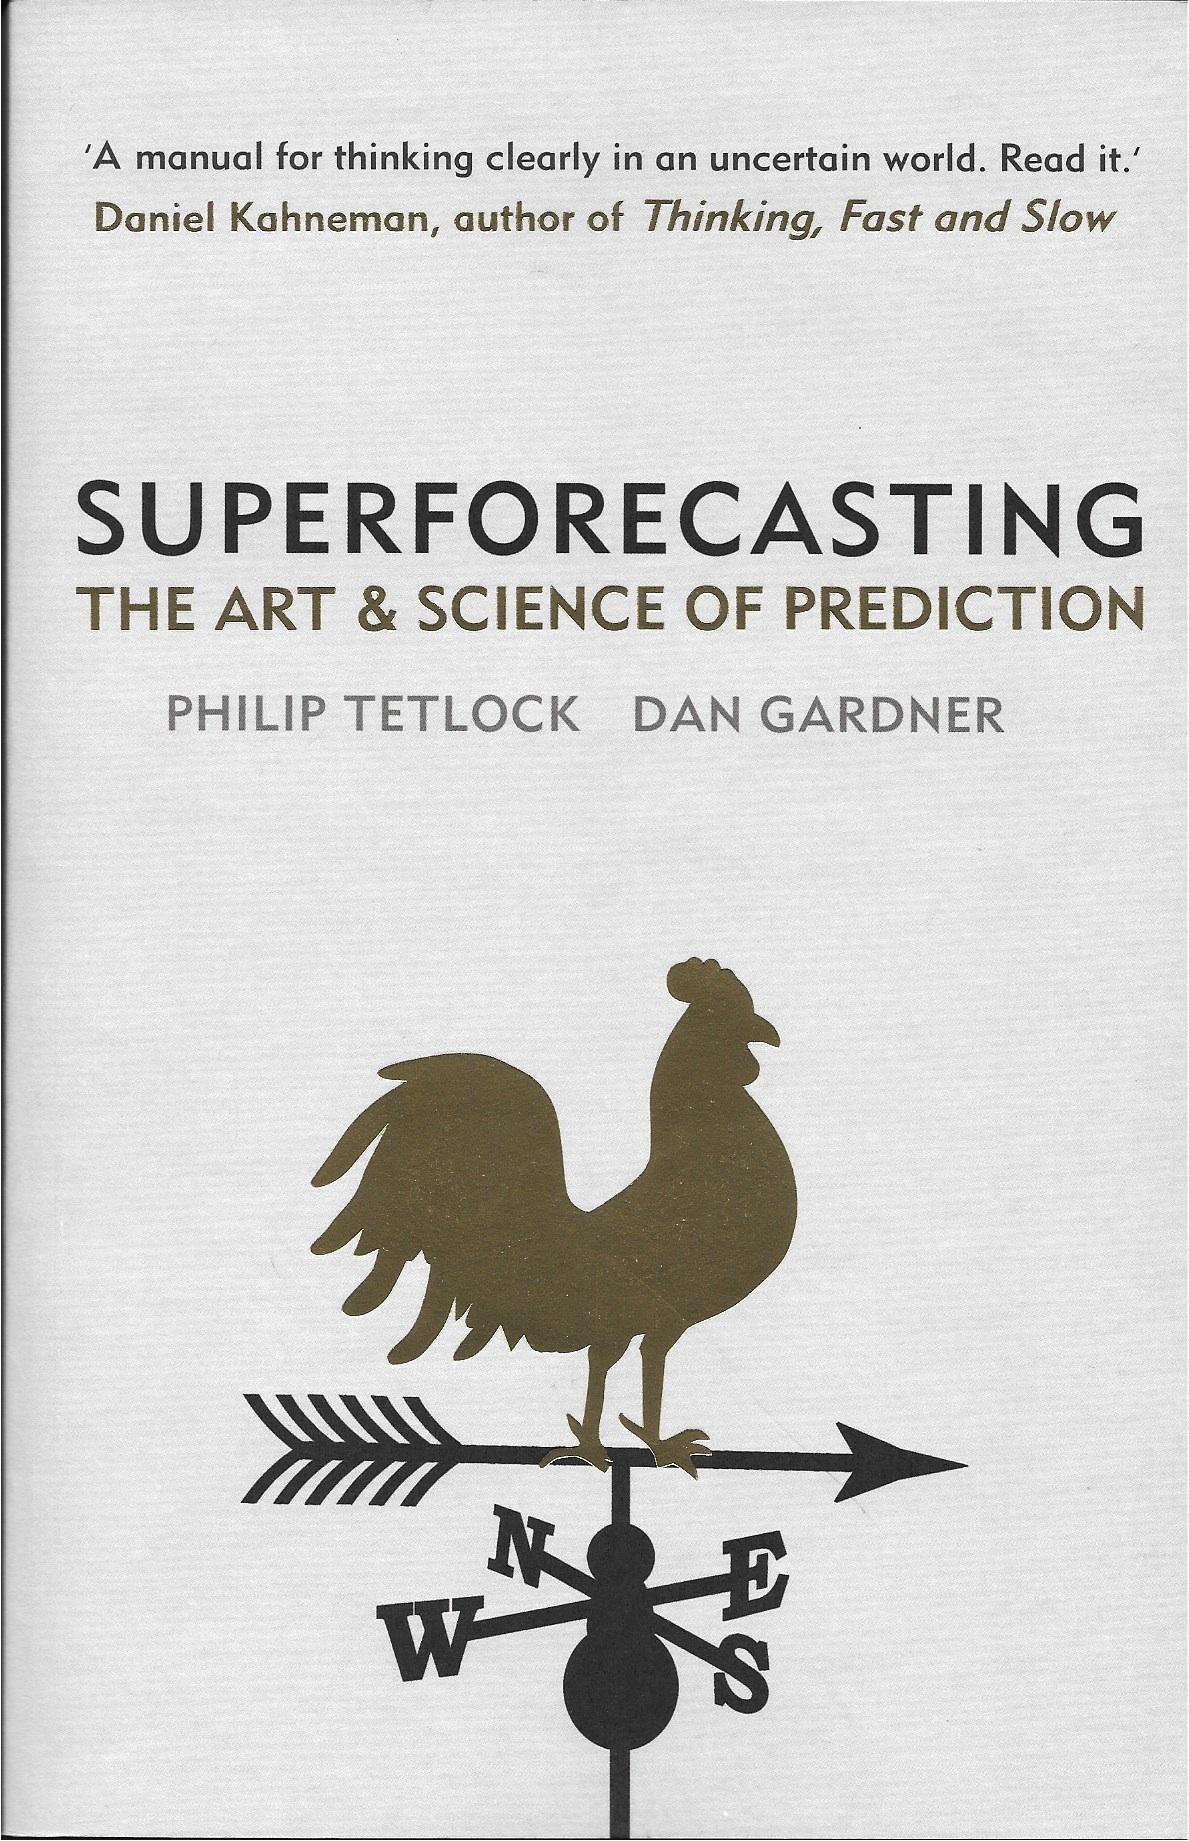 Philip E. Tetlock & Dan Gardner: Superforecasting. The Art and Science of Prediction. Crown 2015, 352 s.